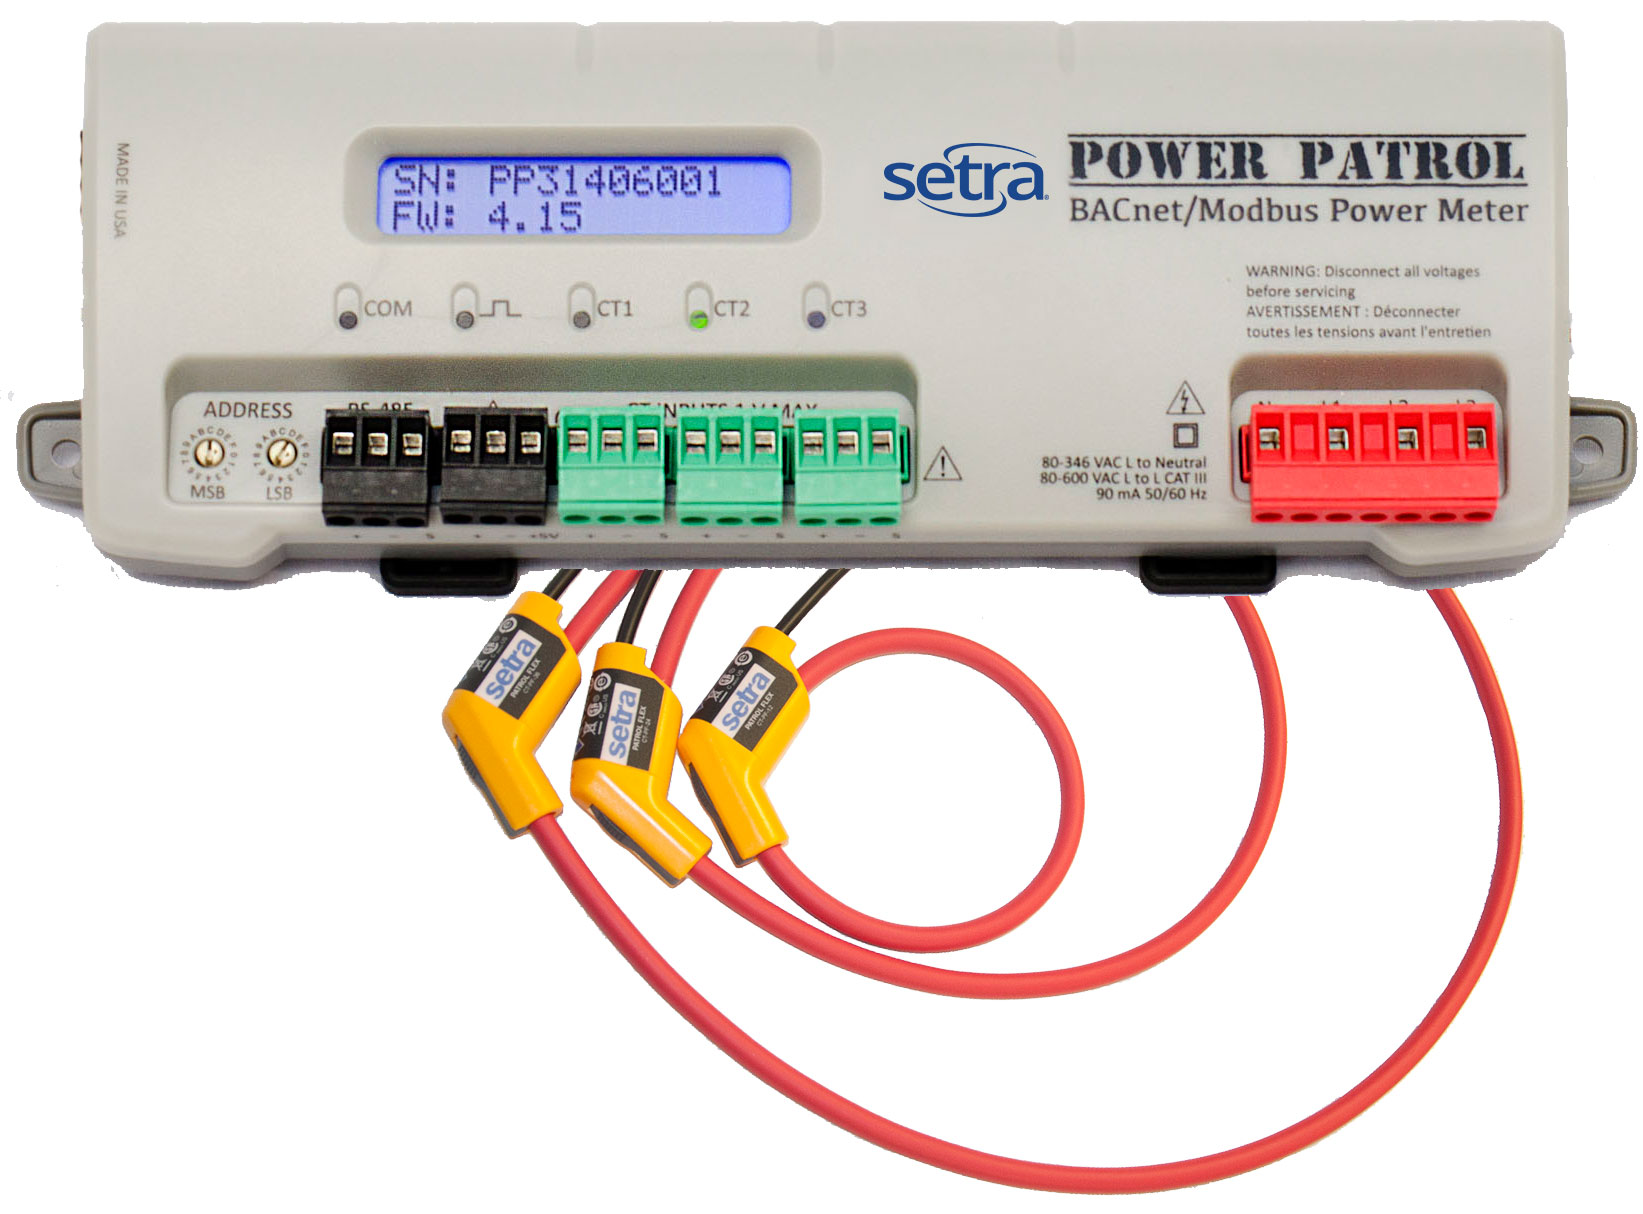 Setra Power Patrol - Networked Power Meter